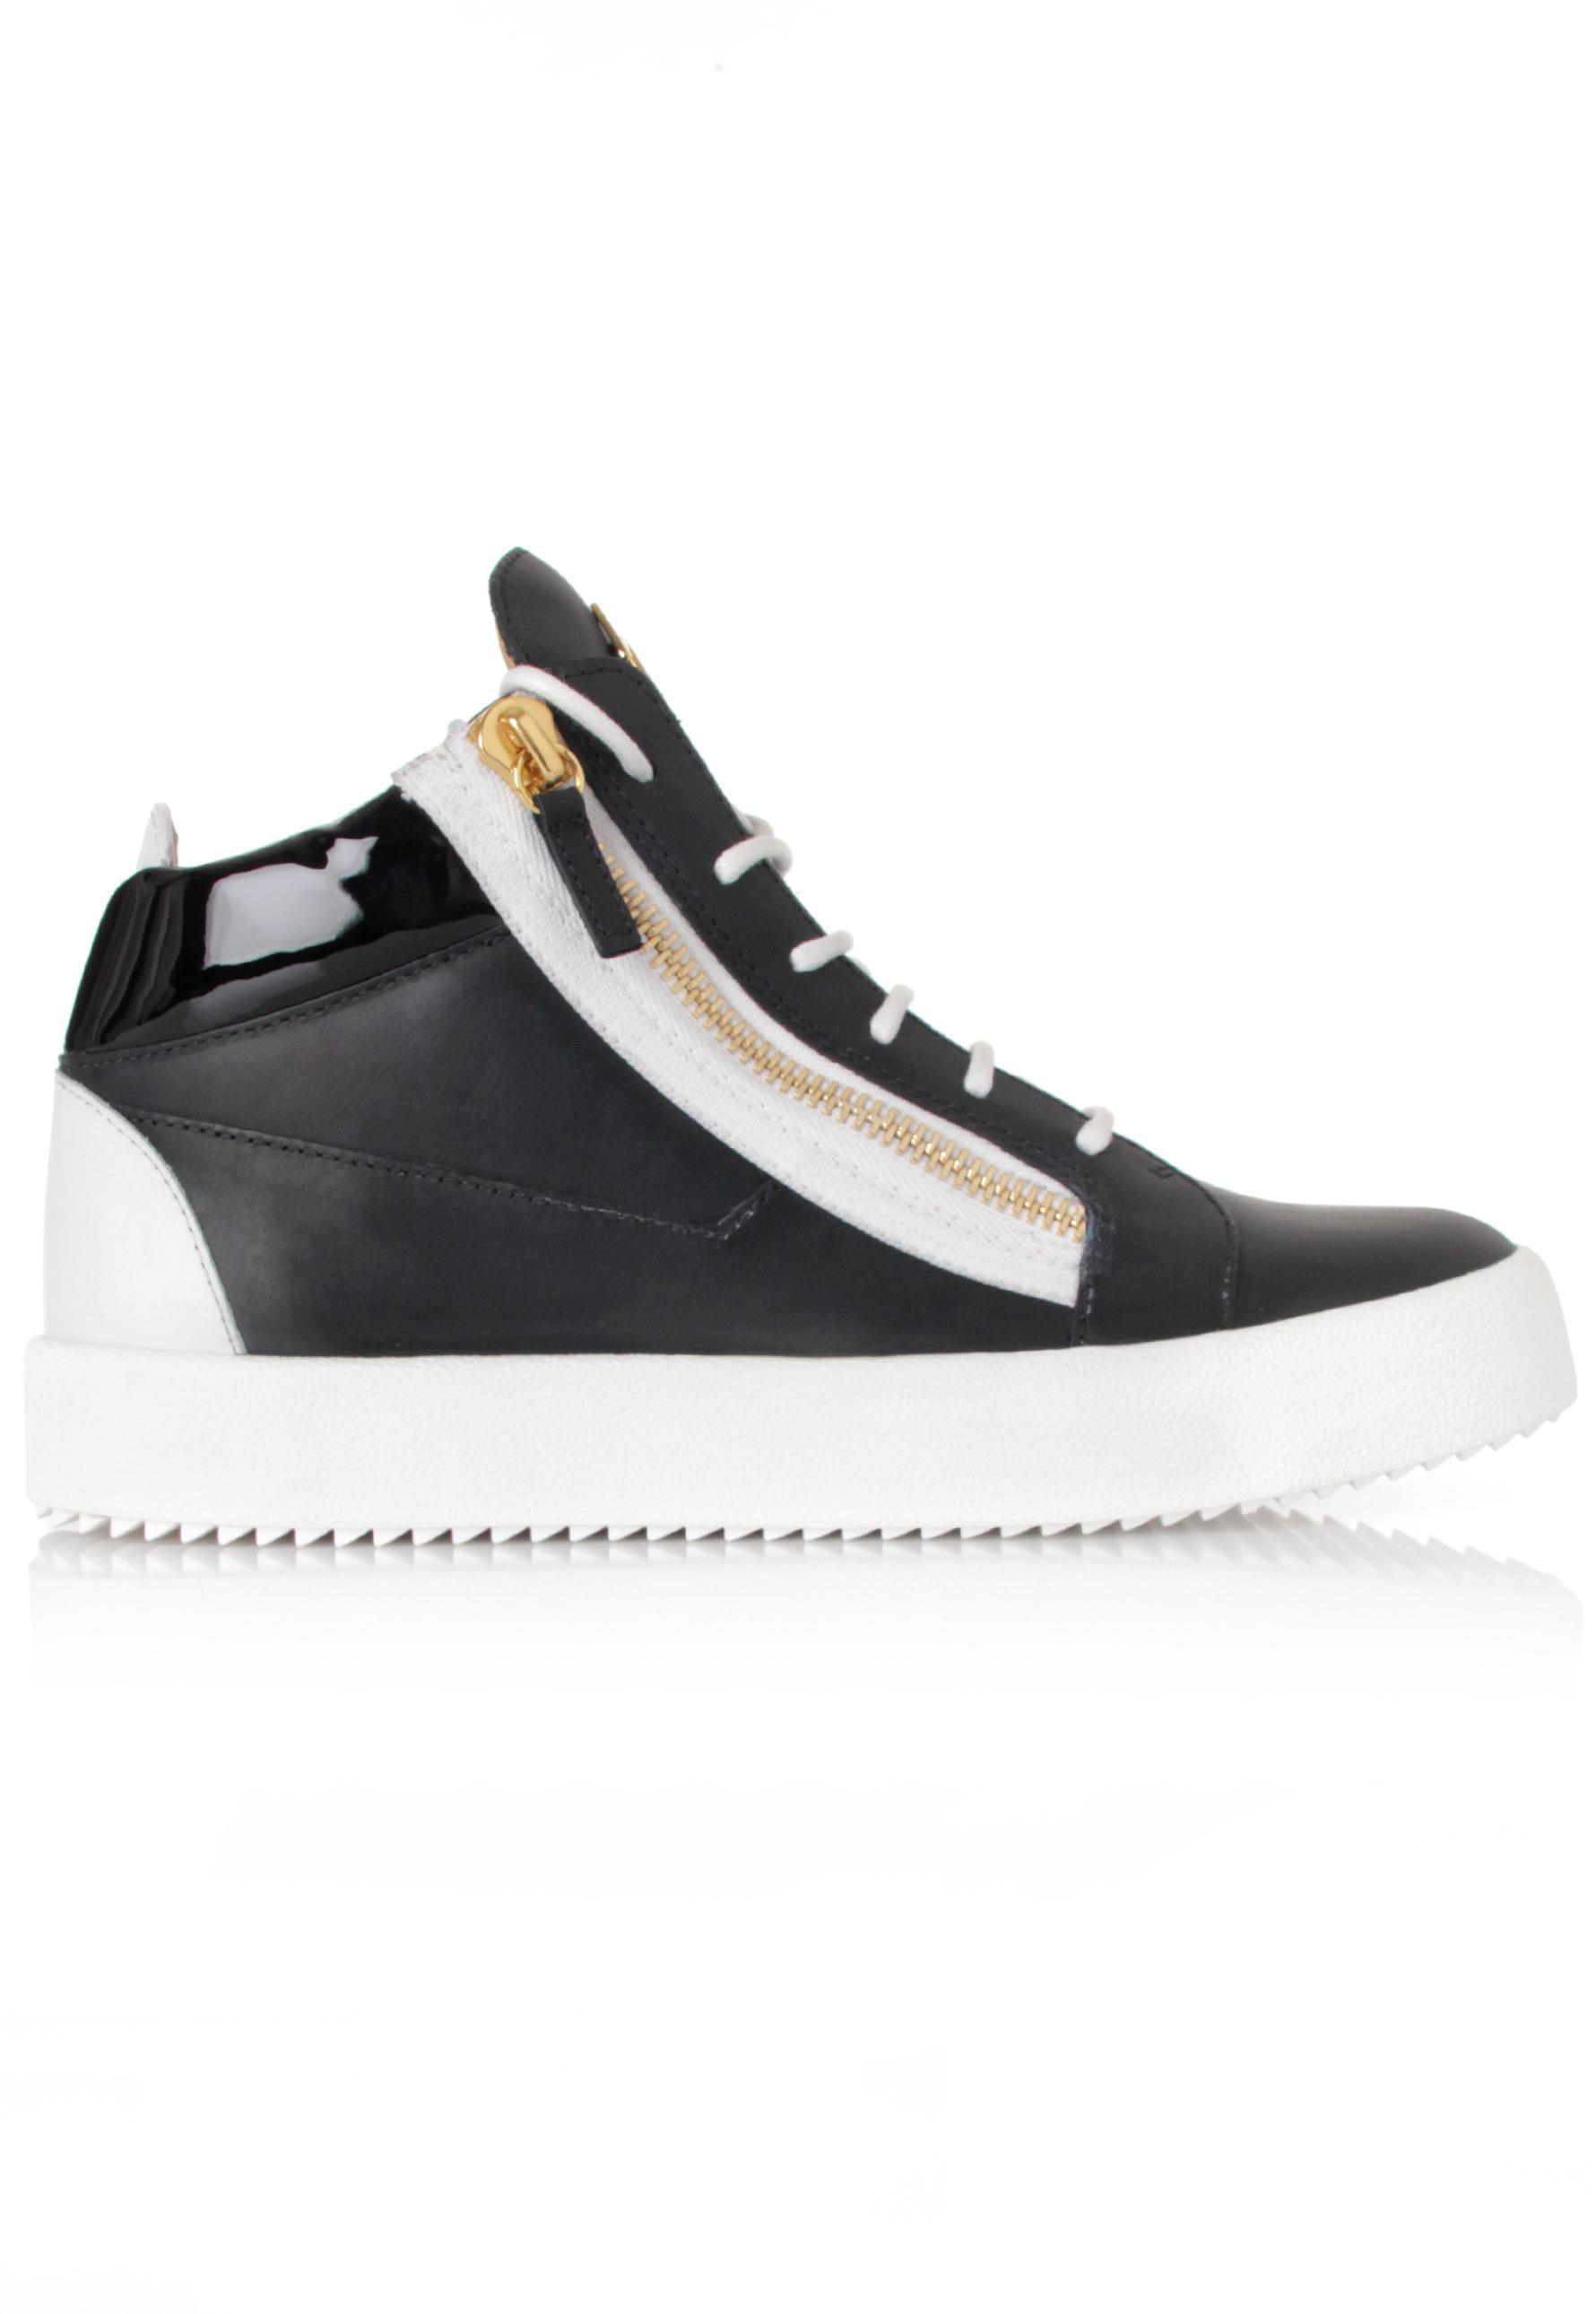 08d3a6a32017d Lyst - Giuseppe Zanotti Kriss Mid-top Sneakers Black/white in Black ...